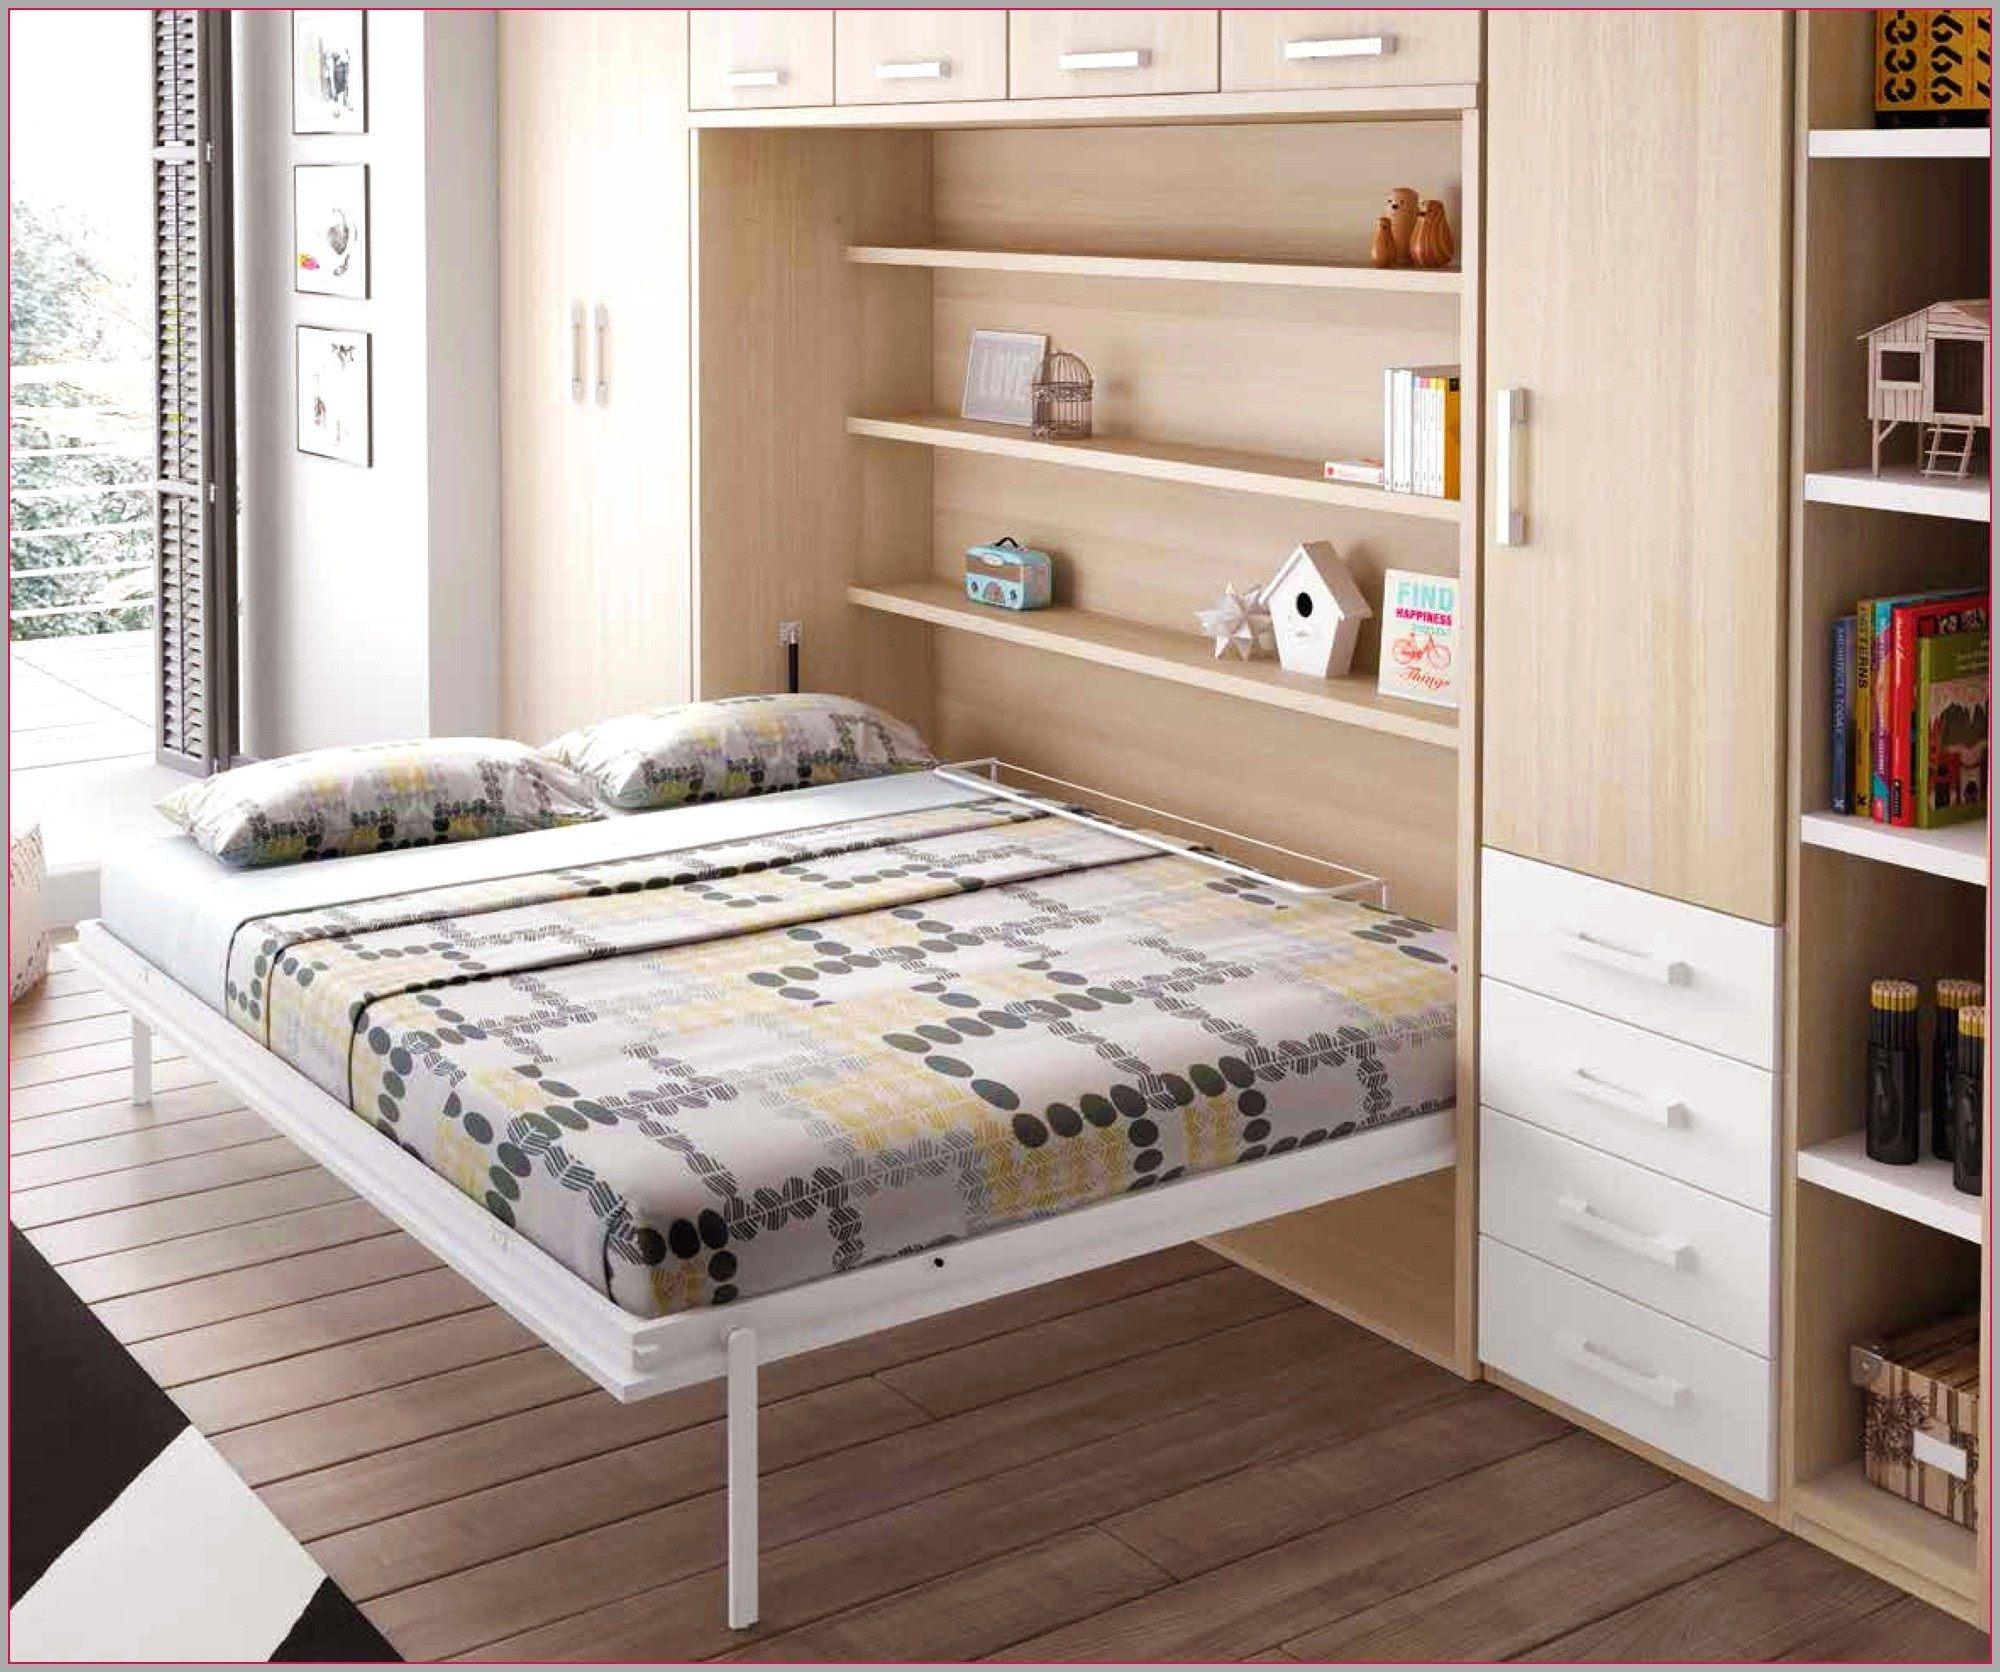 Lit Tiroir Ikea Beau Impressionnant Matelas Pour Tiroir Lit 0d Les Lit Tiroir Lit Unique